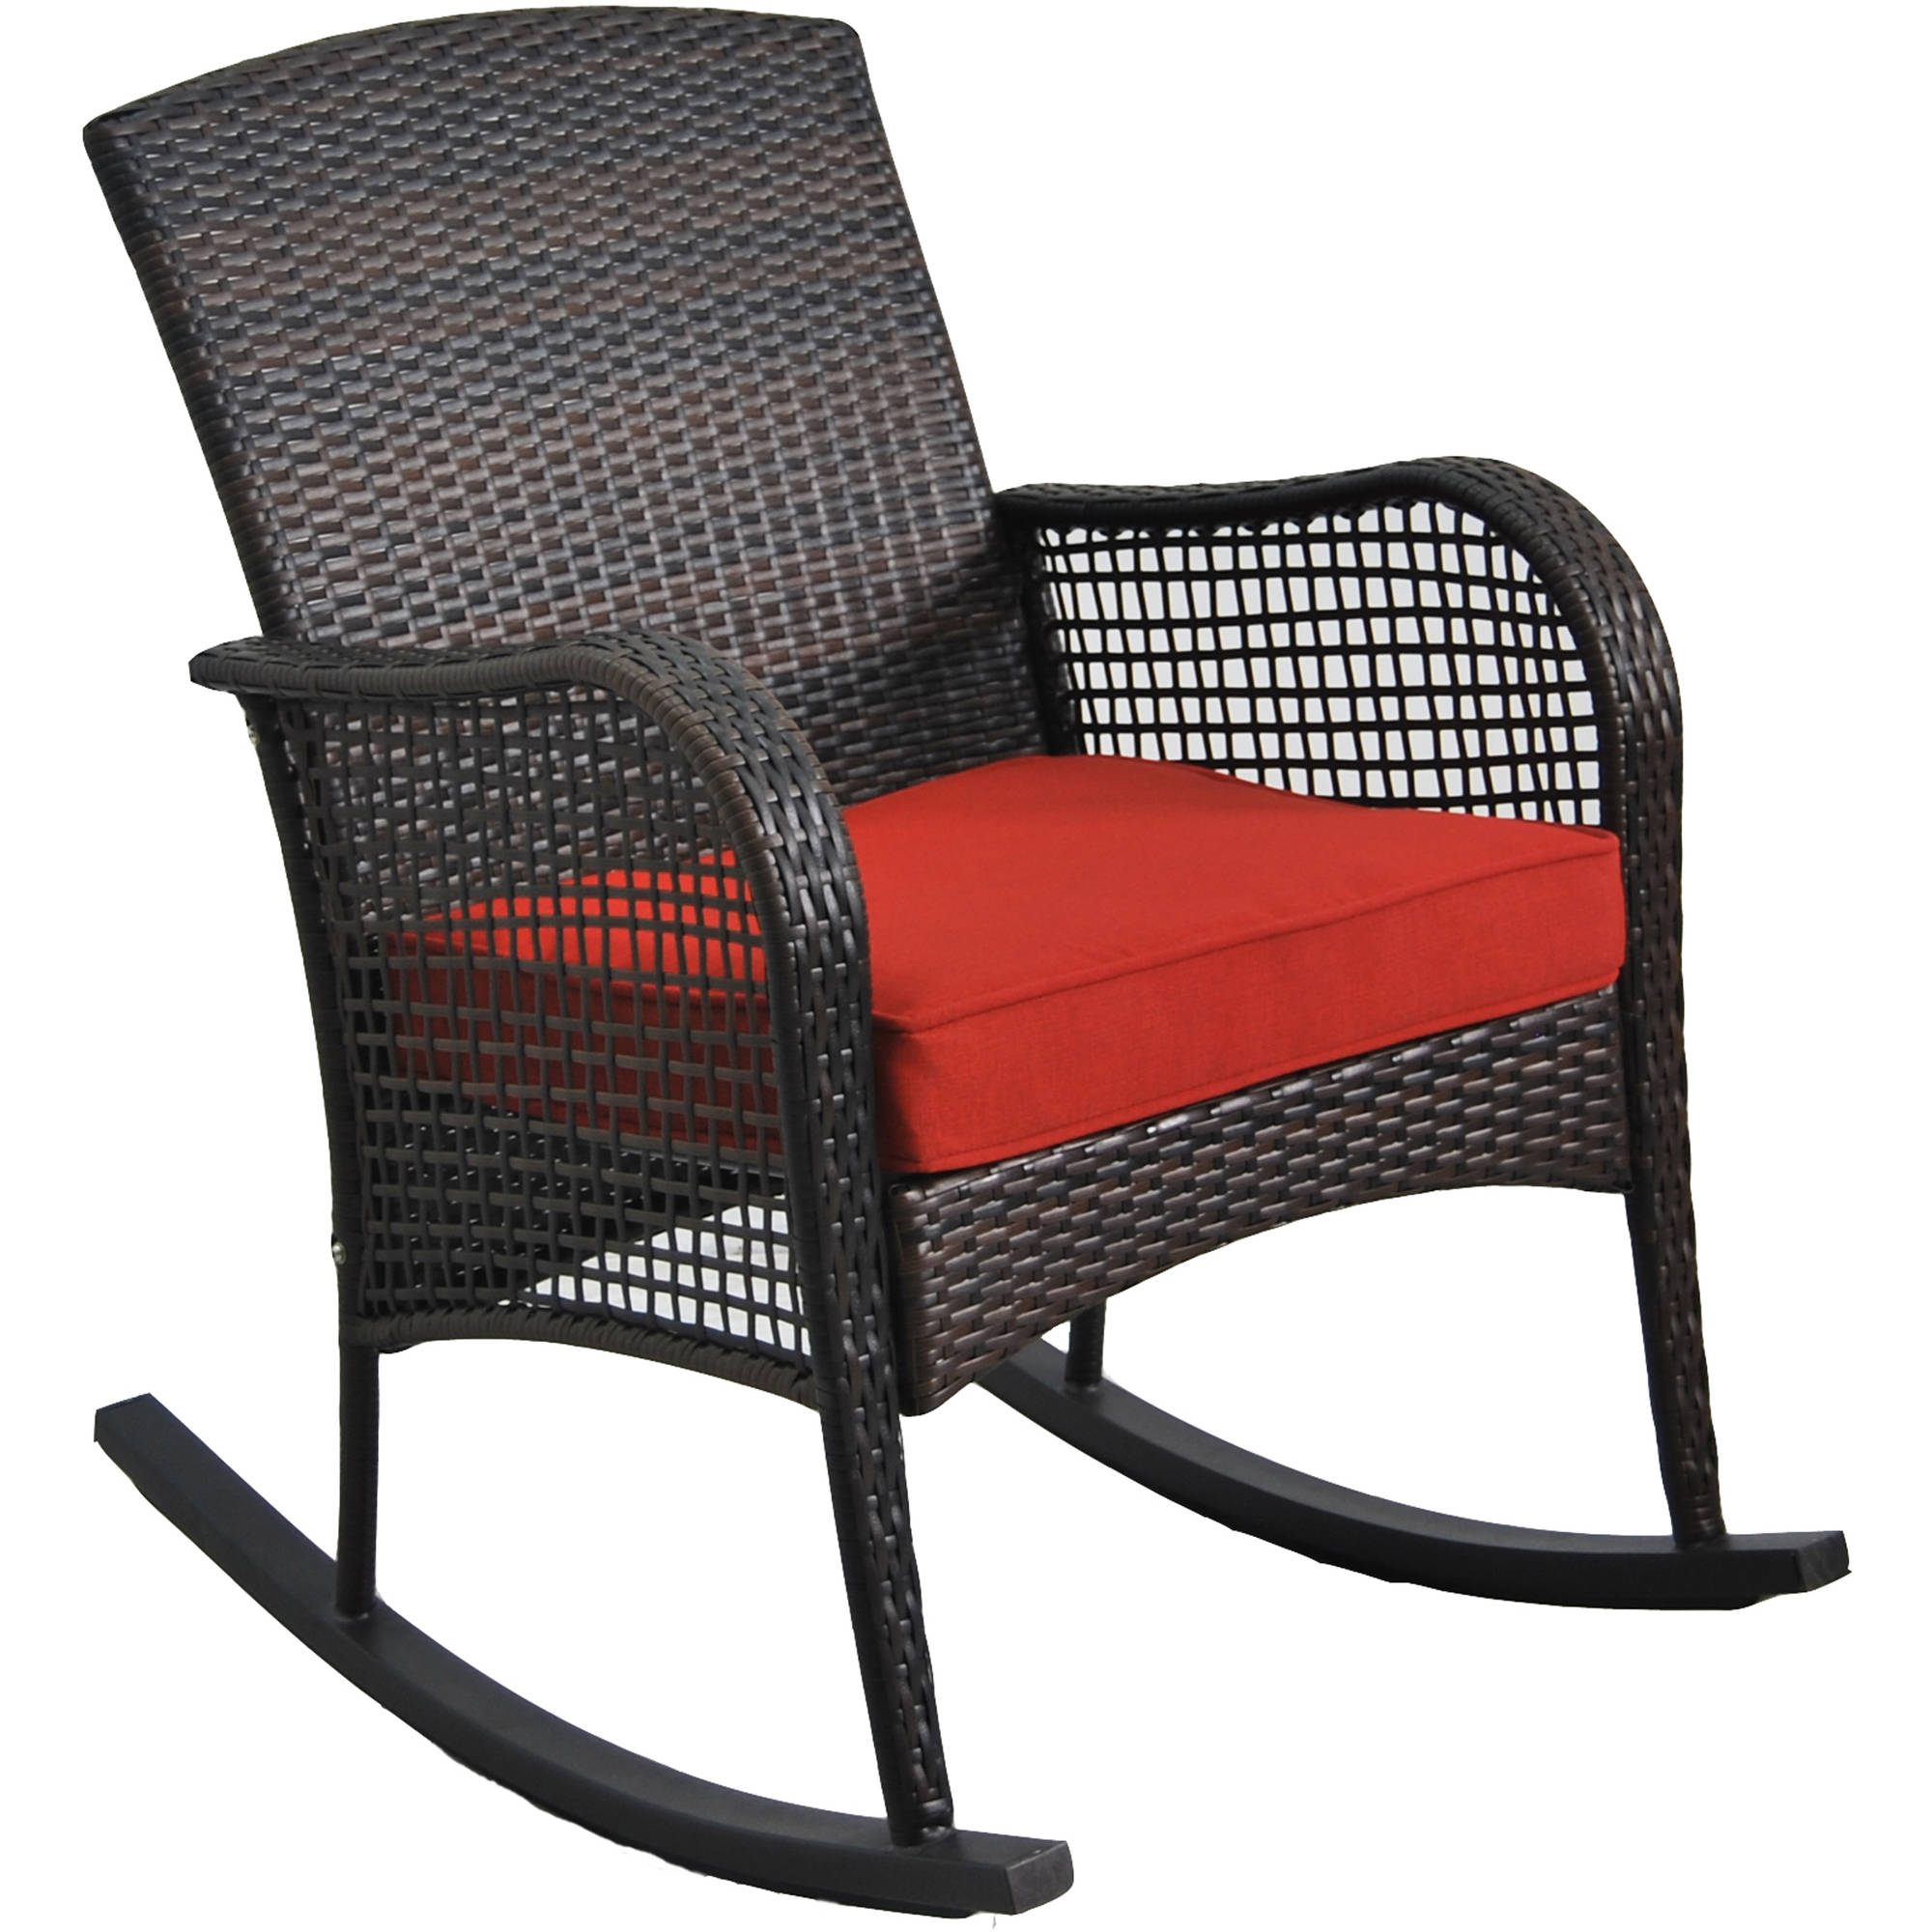 mainstays cambridge park wicker outdoor rocking chair